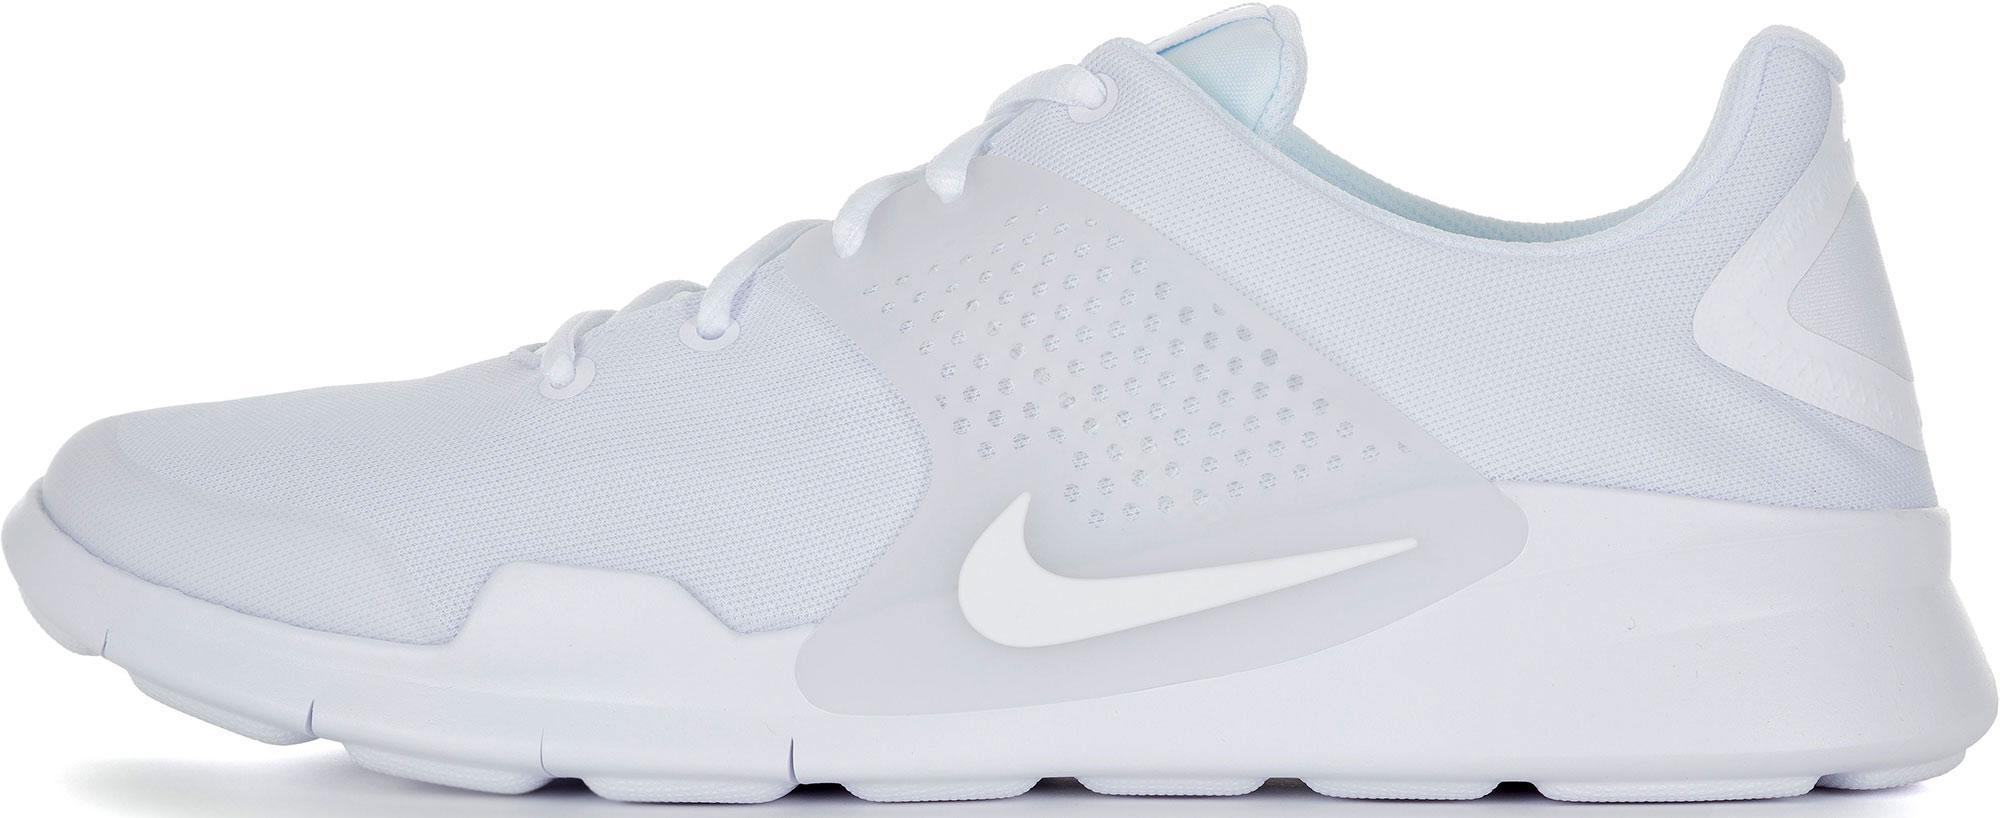 Nike Кроссовки мужские Nike Arrowz, размер 46,5